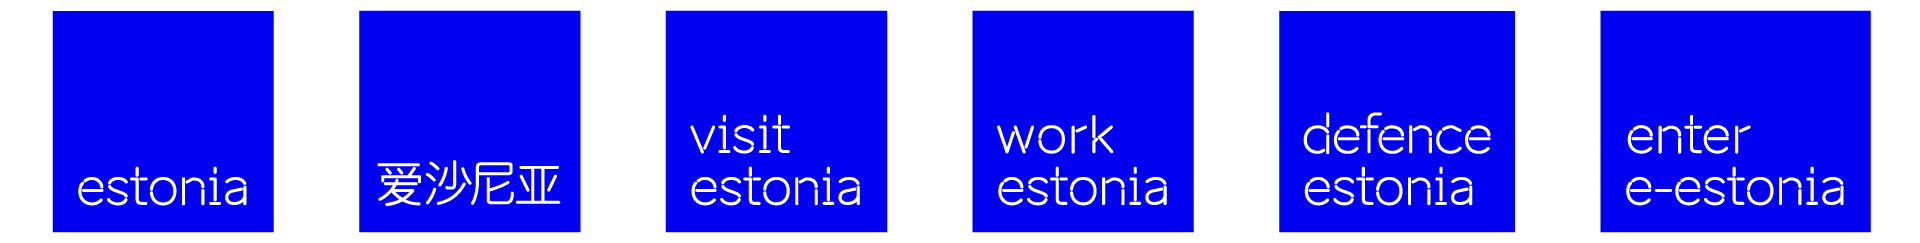 brand estonia wordmark examples